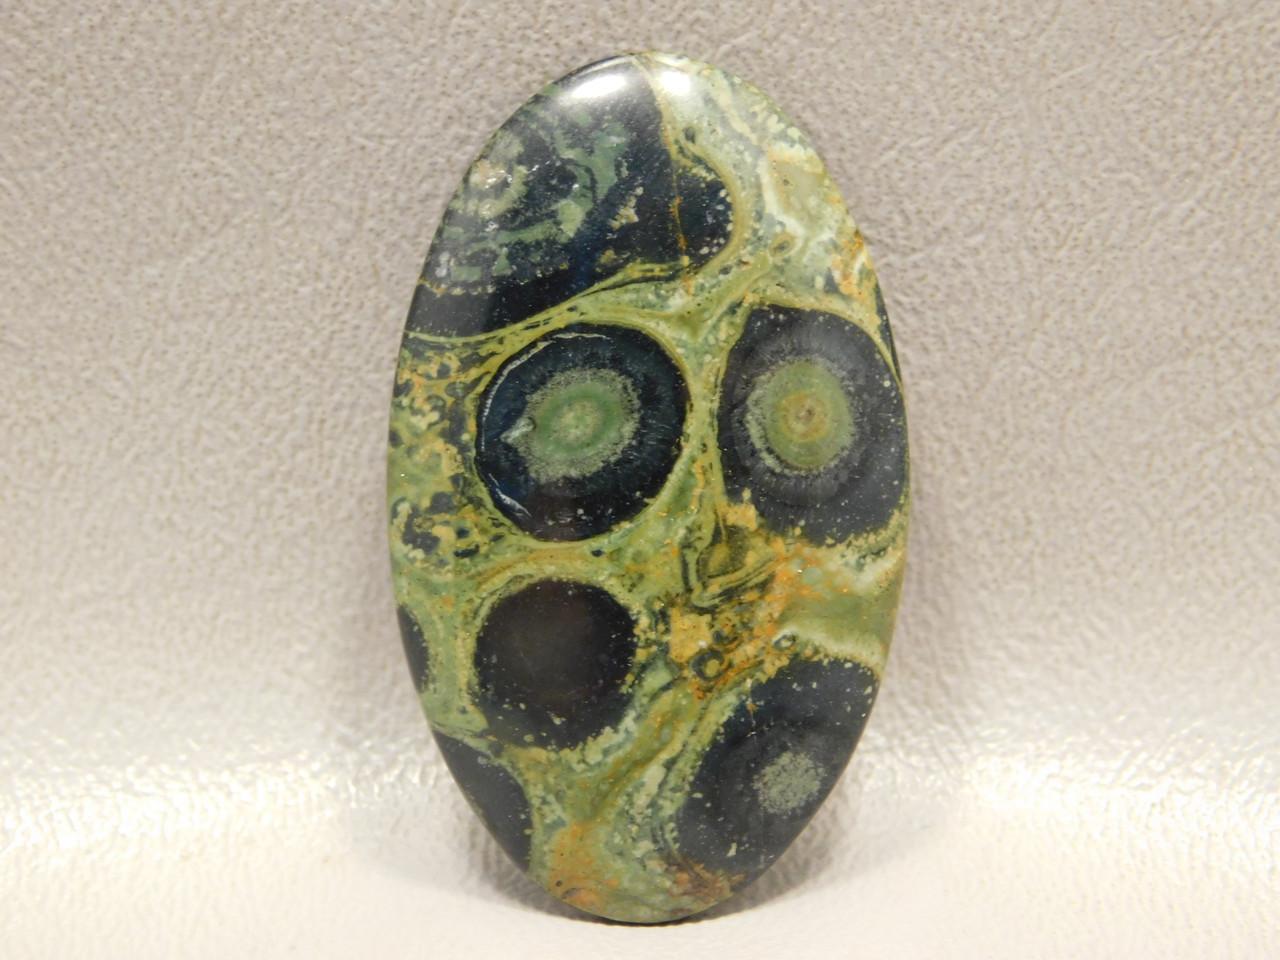 Cabochon Kabamba Jasper Fossil Green Black Orbs Stone #14